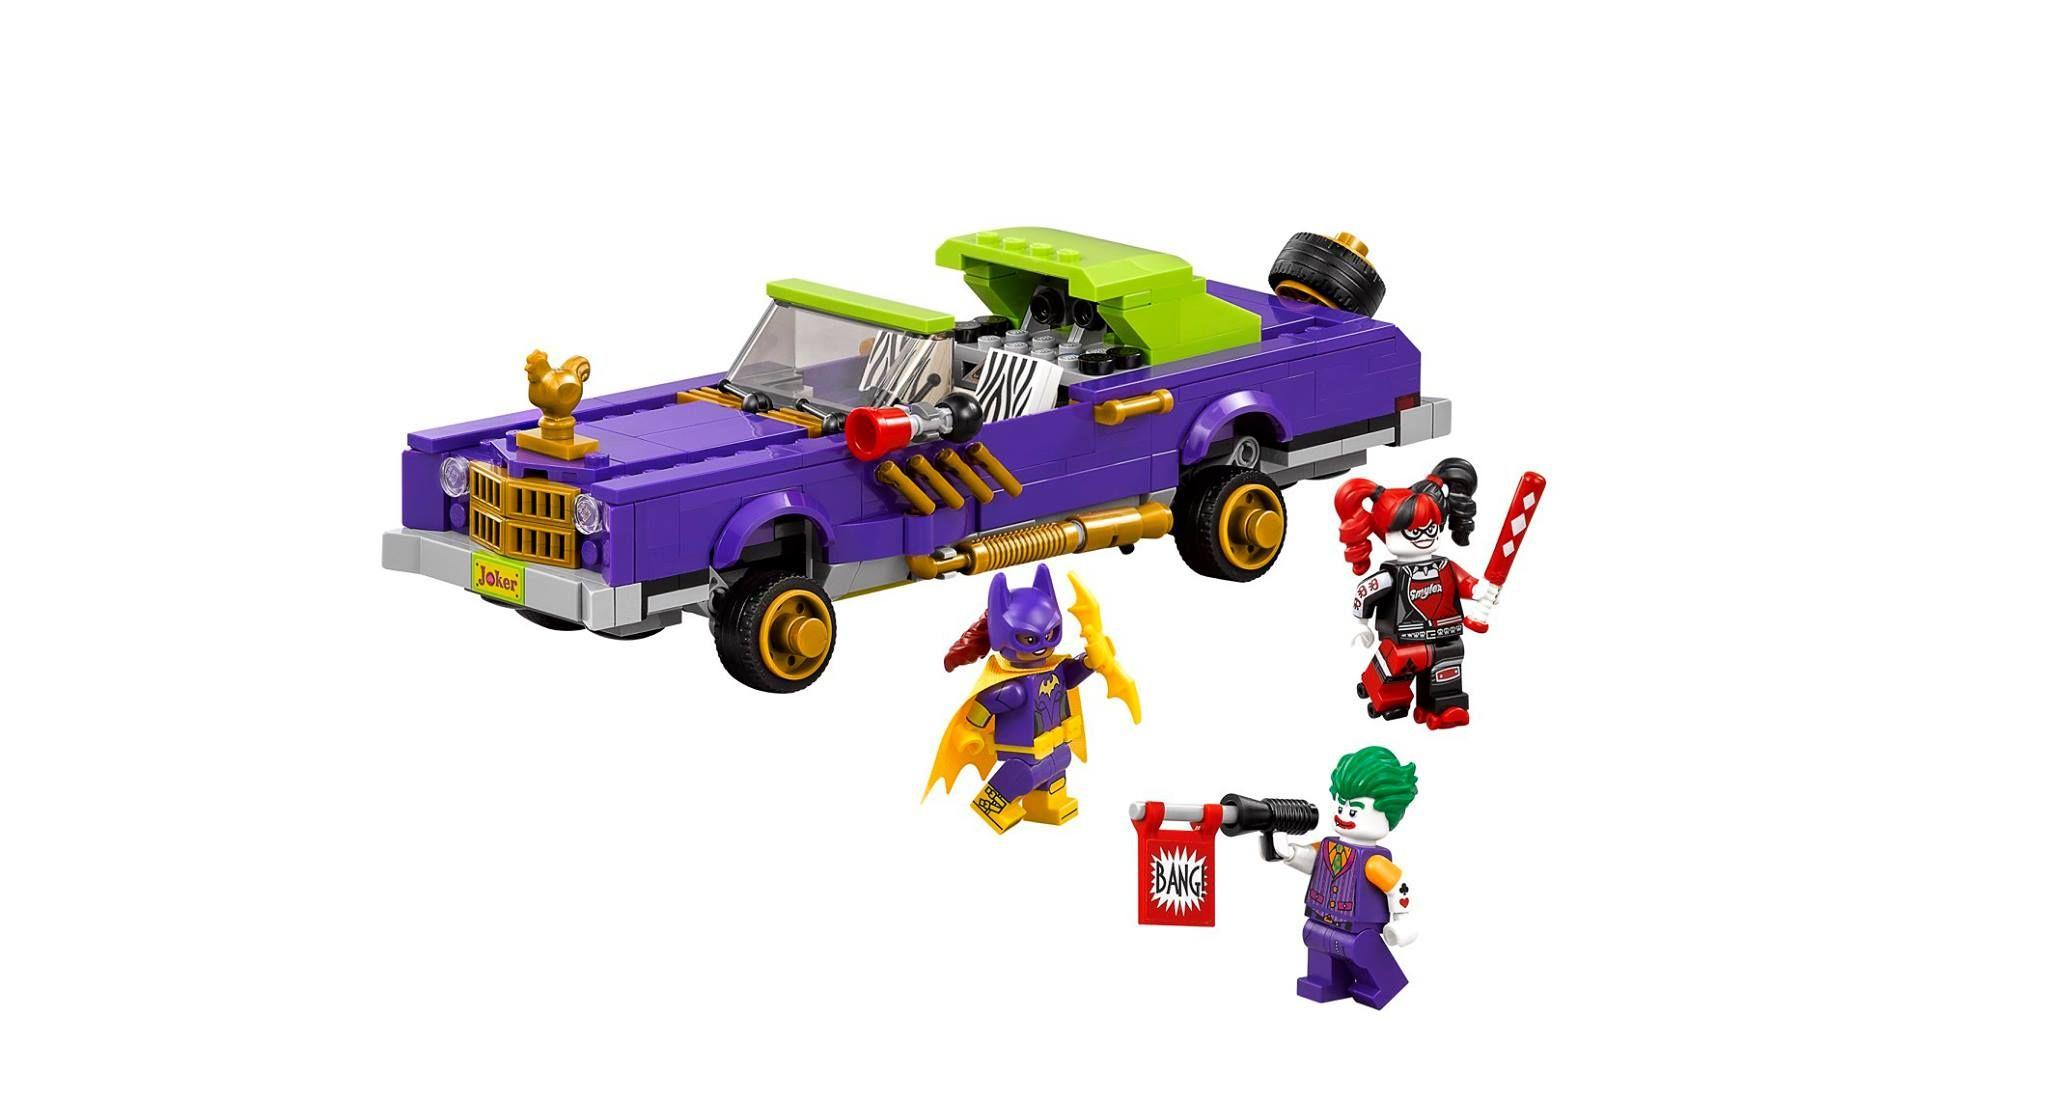 View source image Lego batman movie, Lego batman, Batman